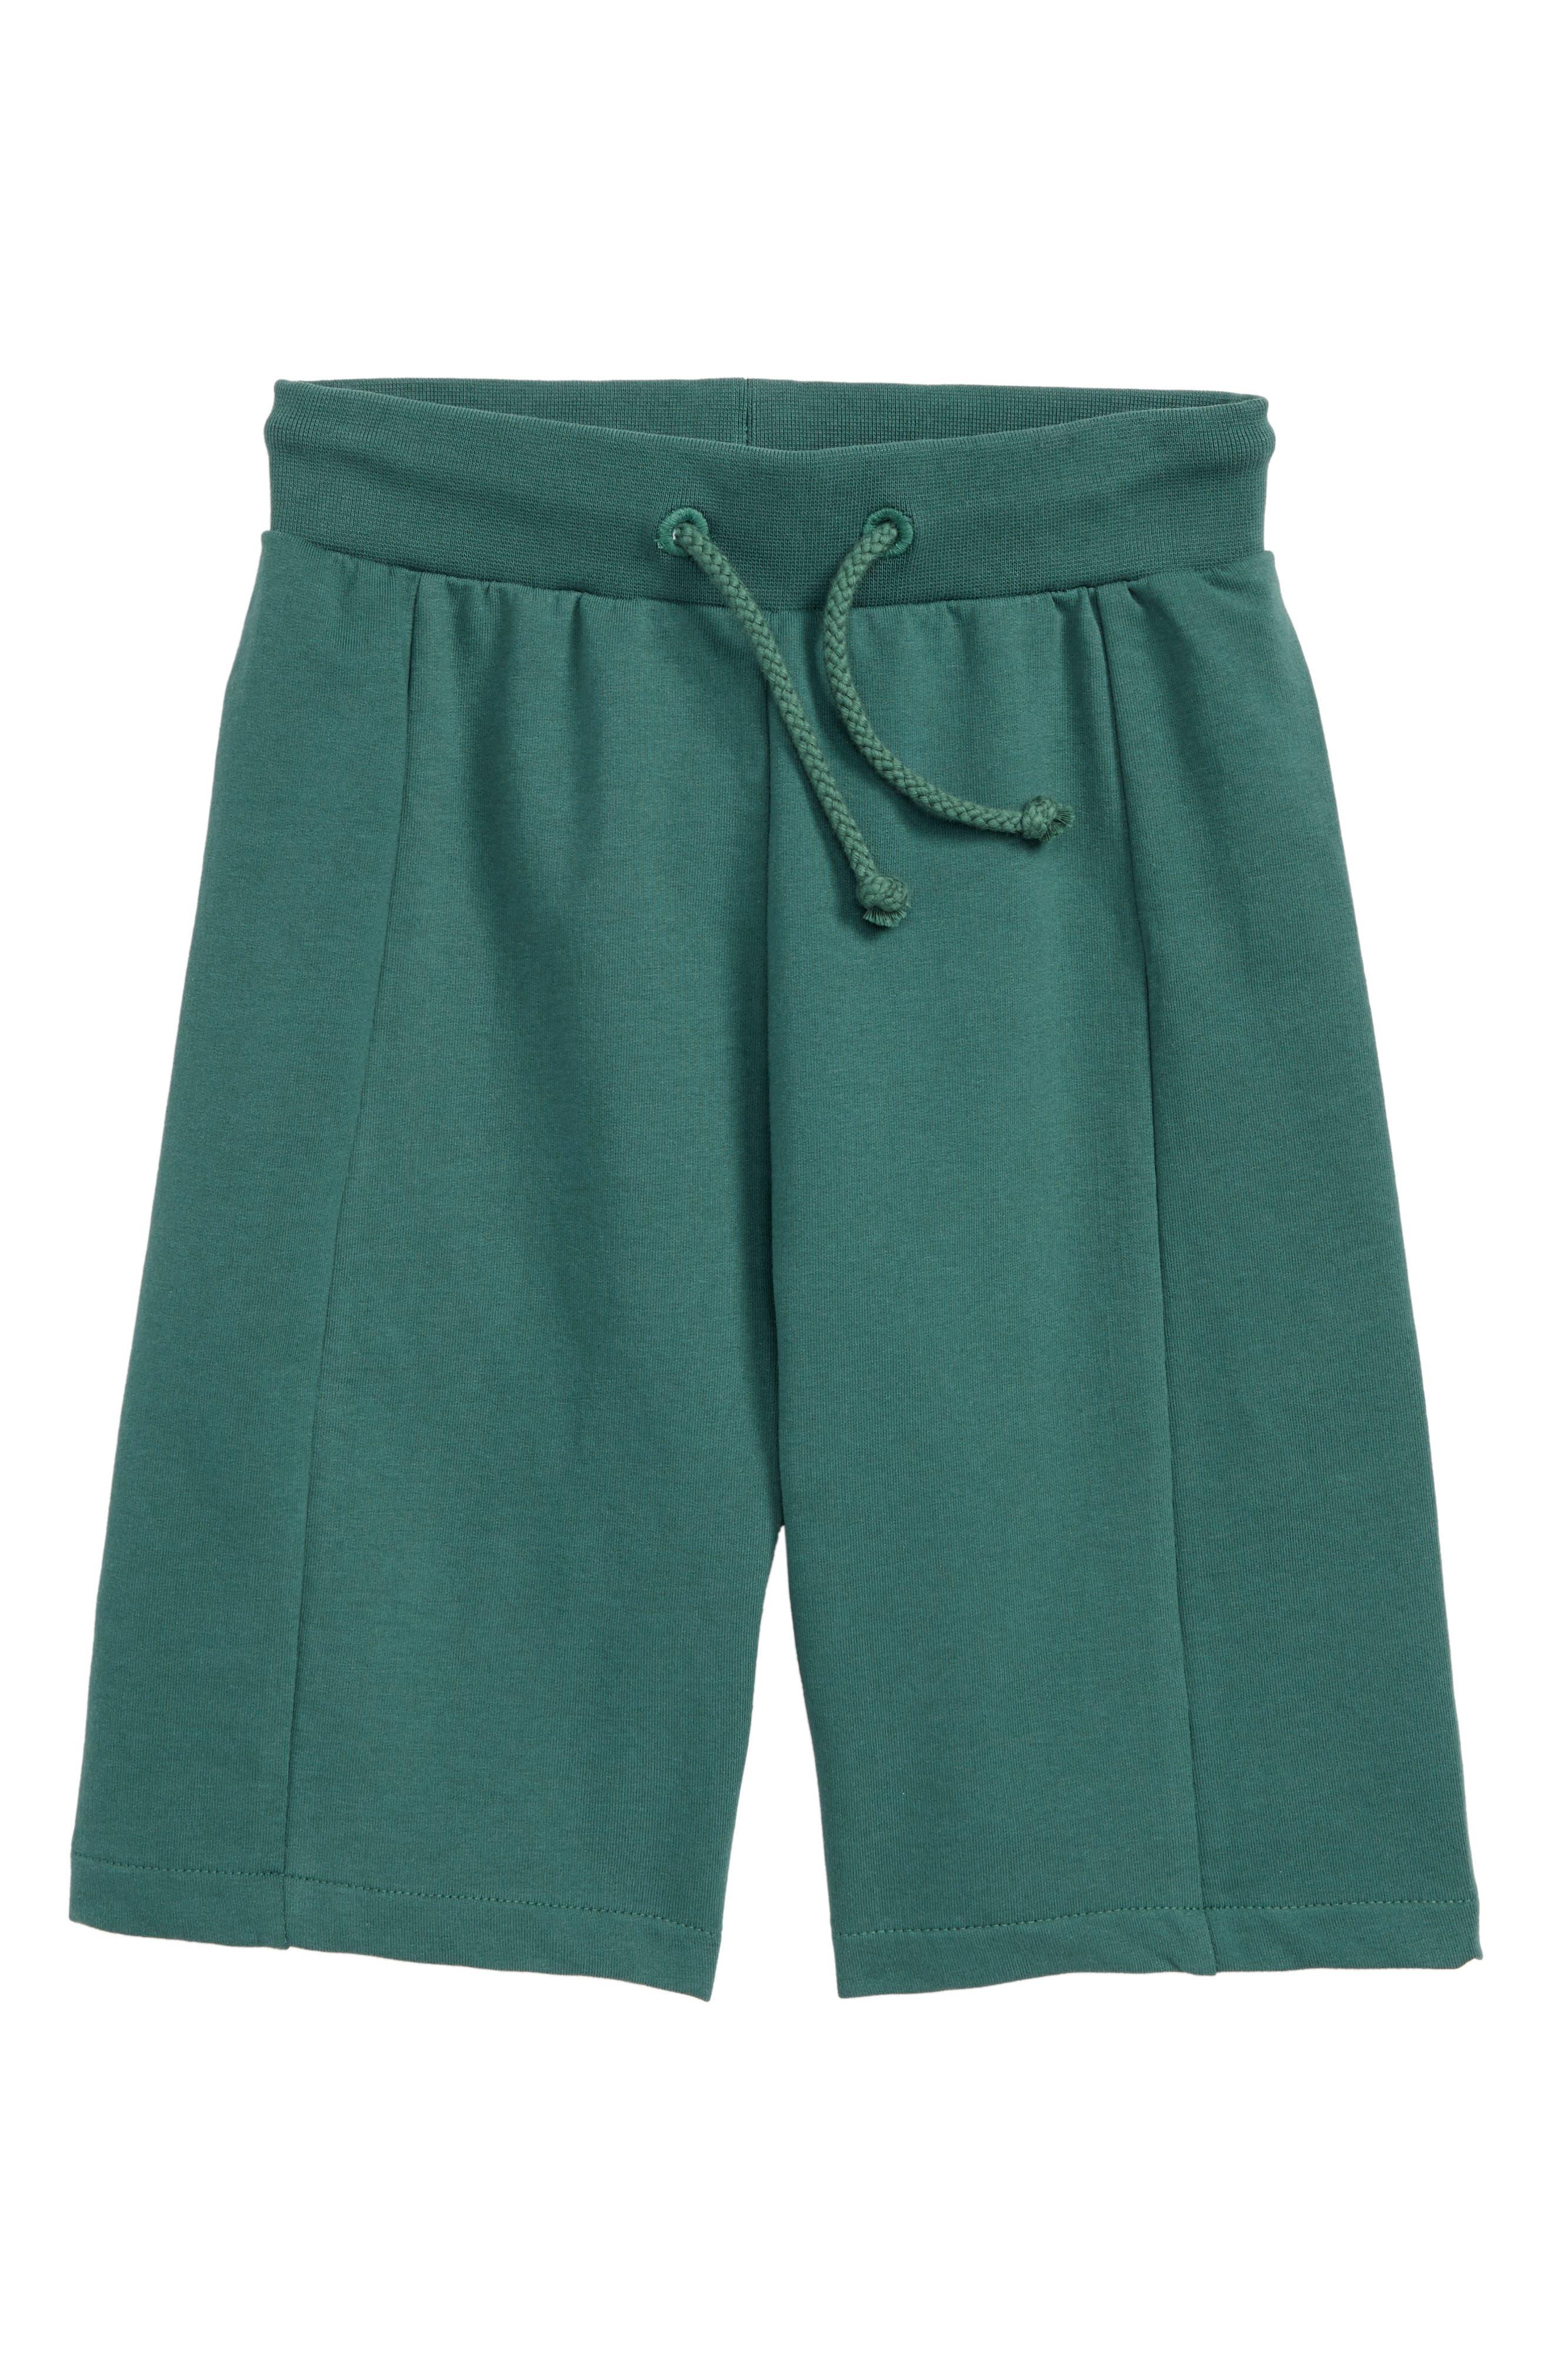 Boys Sometime Soon Alvin Shorts Size 6Y  Green